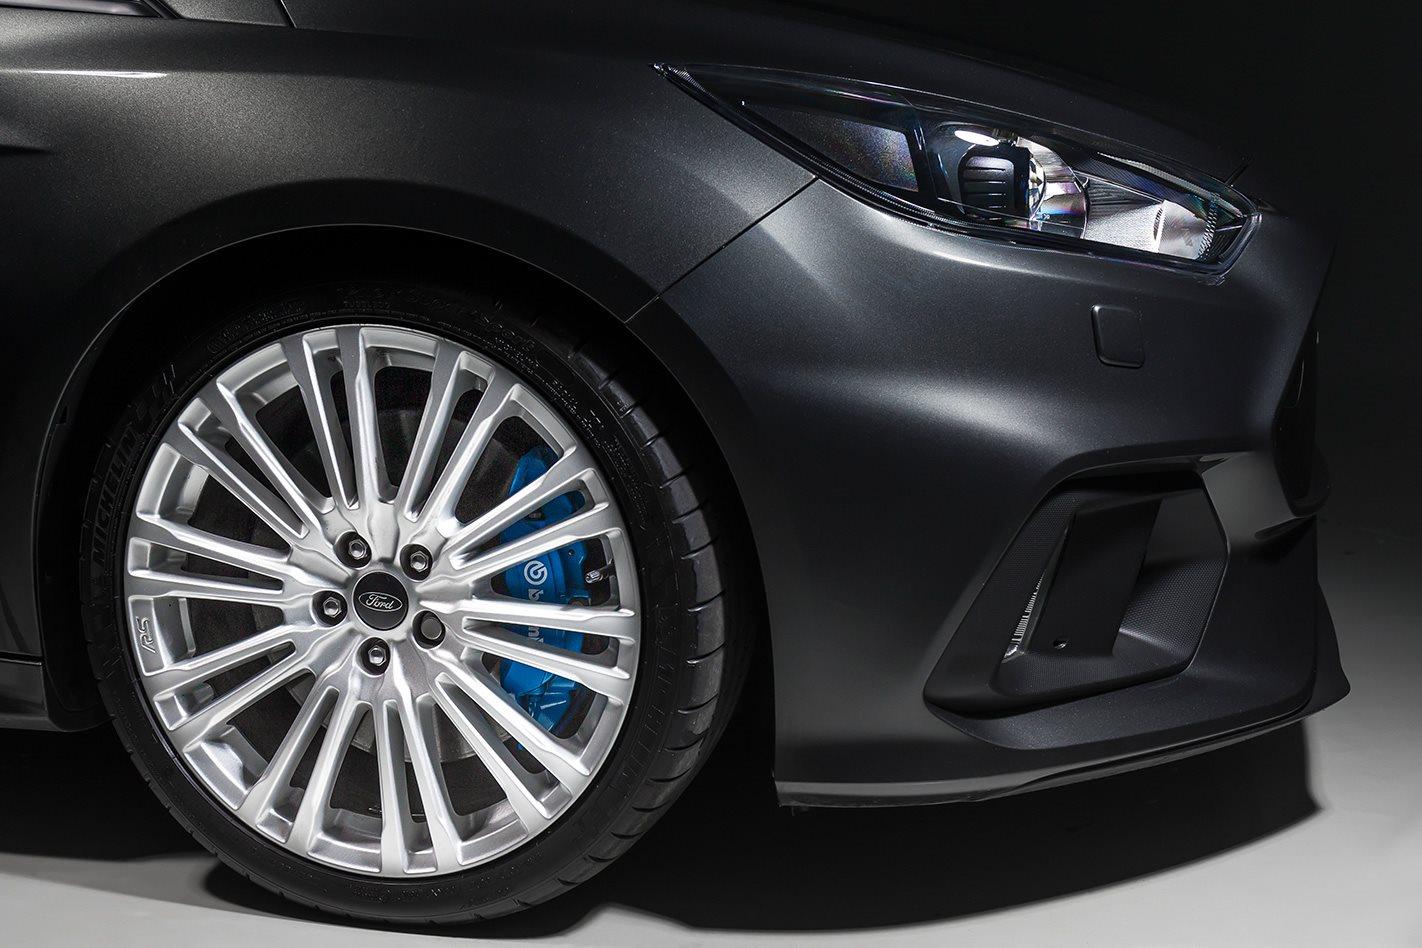 2017-Ford-Focus-RS-wheel.jpg